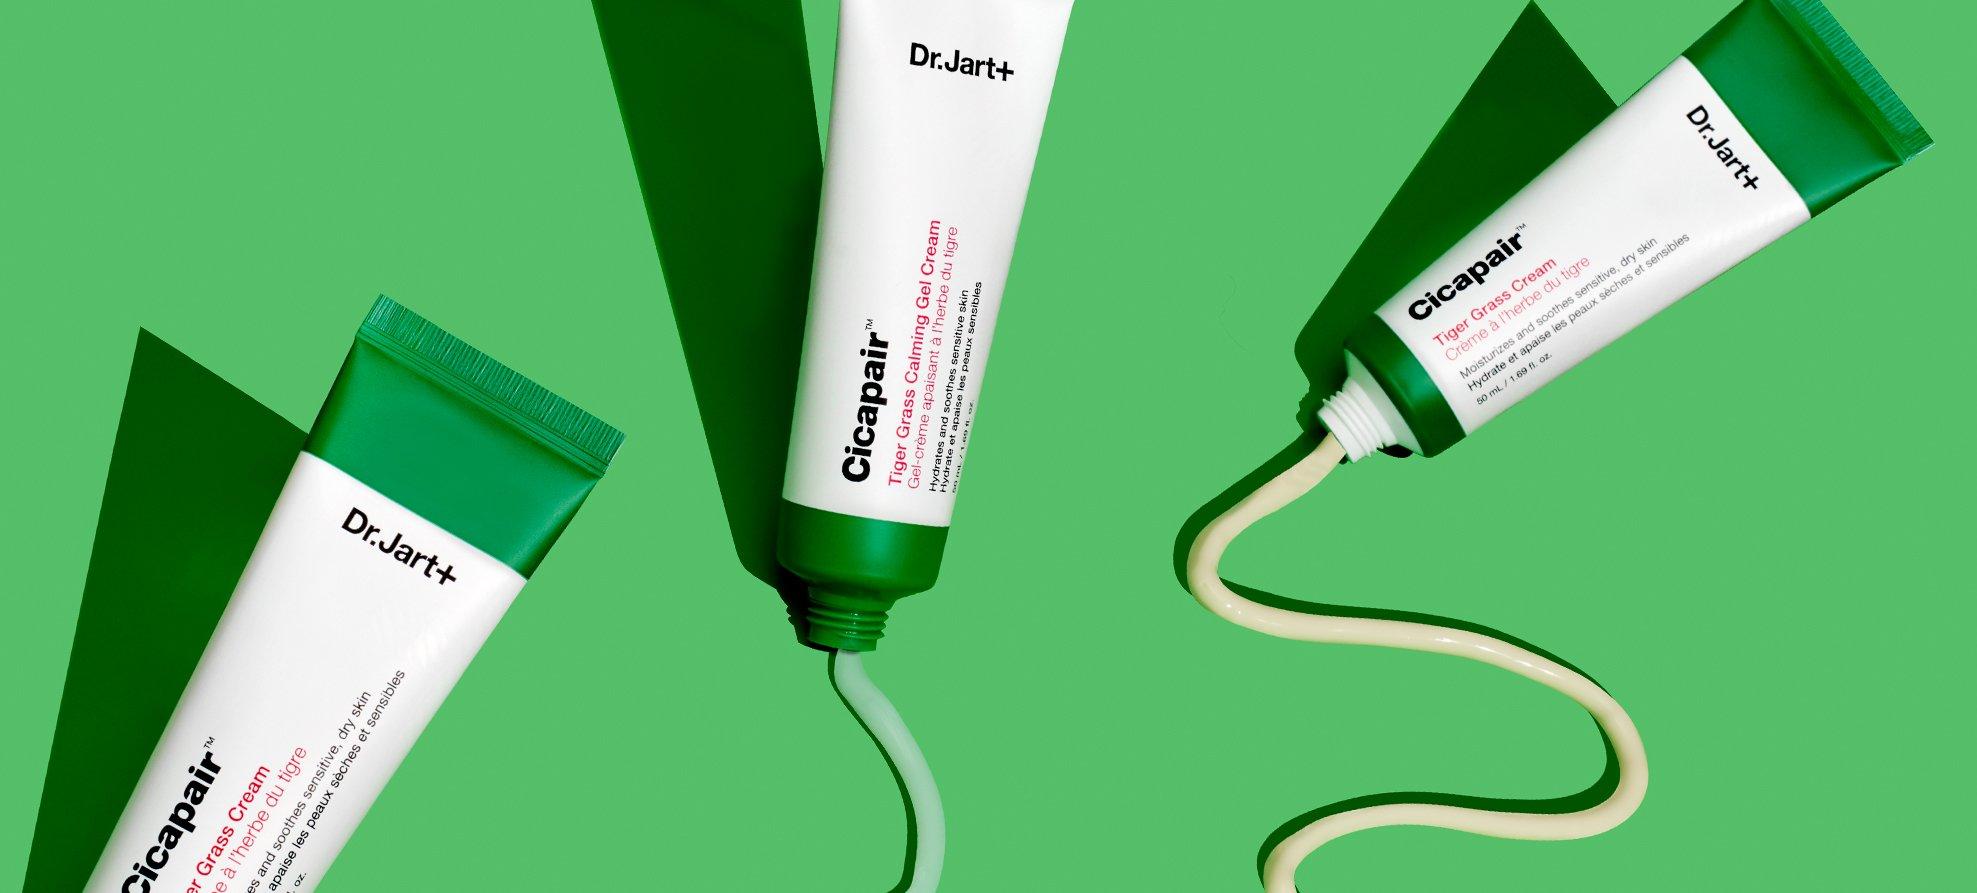 sản phẩm chăm sóc da Dr.Jart + Cicapair Tiger Grass Calming Gel Cream